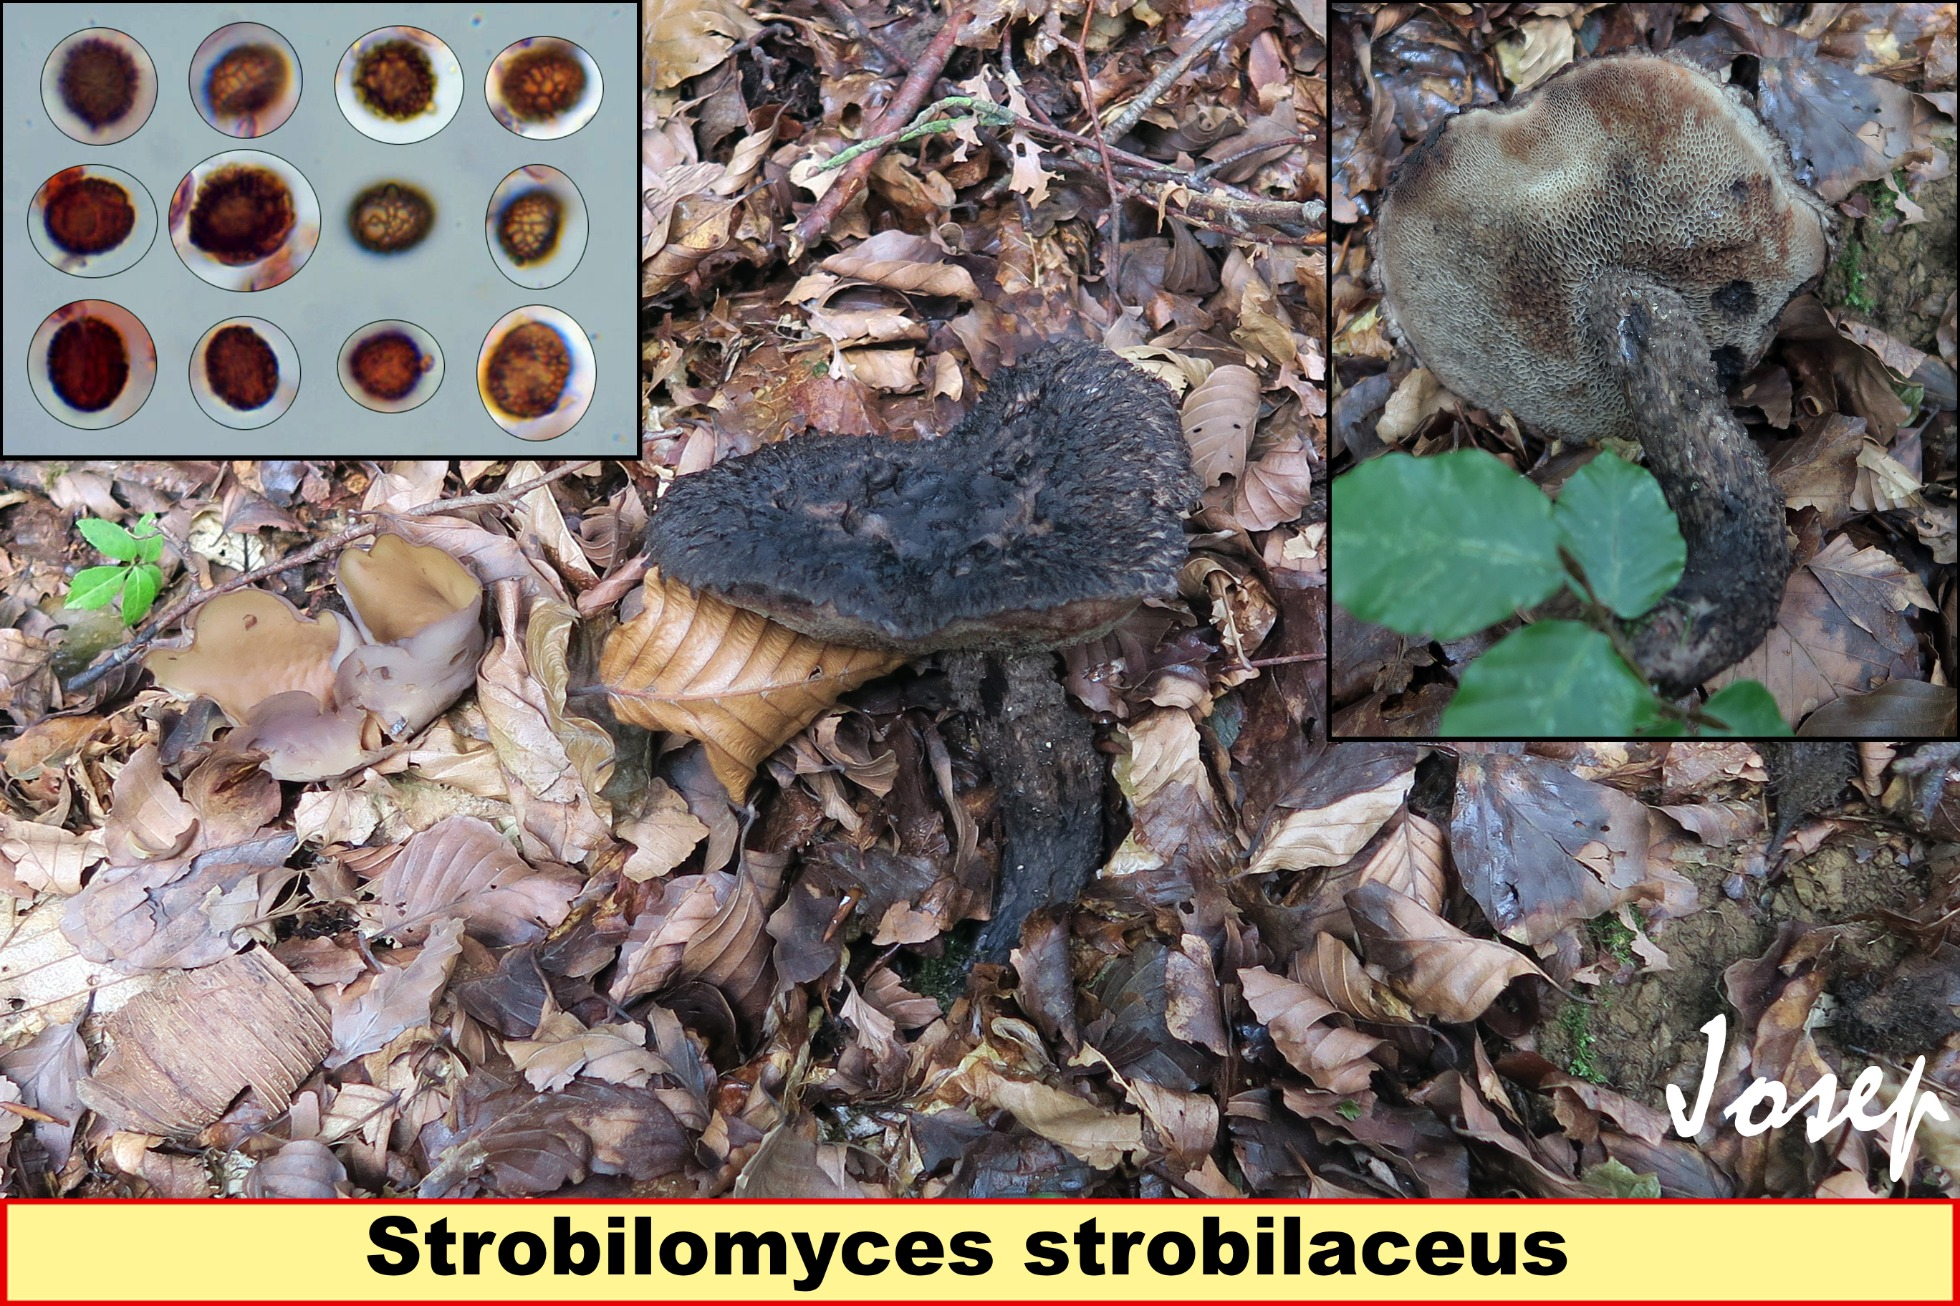 Strobilomycesstrobilaceus_2020-10-30.jpg